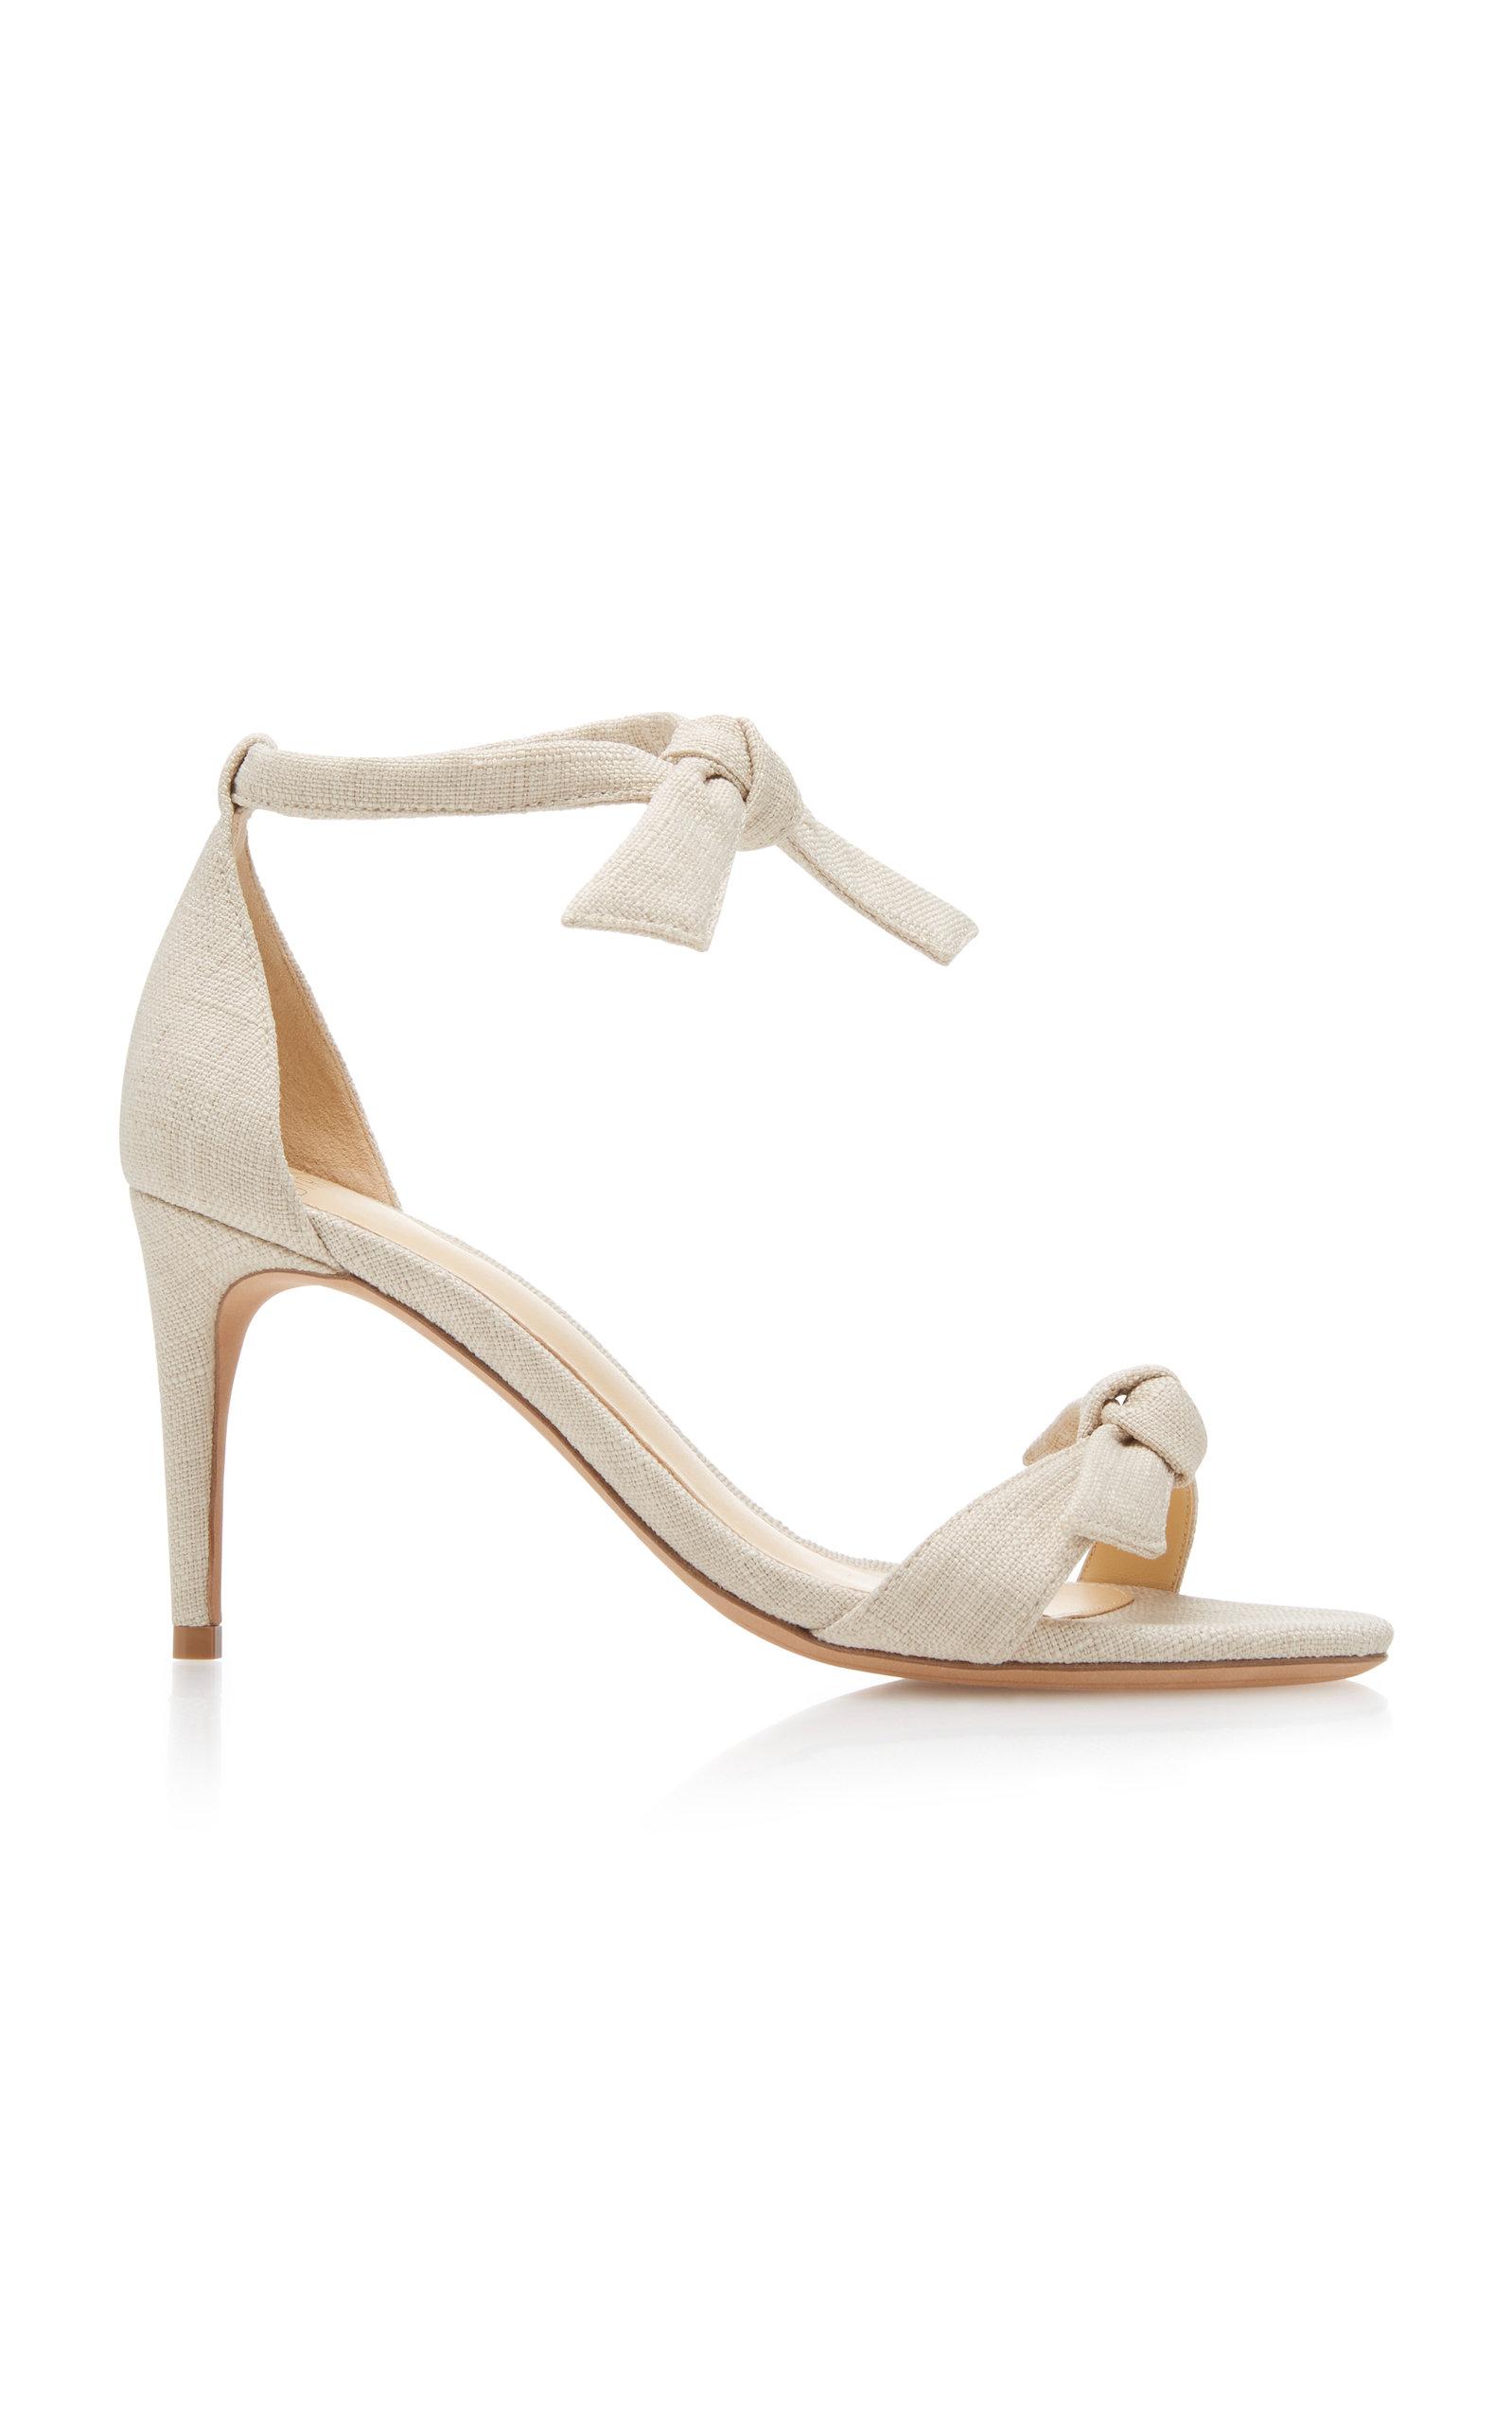 ALEXANDRE BIRMAN Clarita Linen Sandal 0Q68Ni